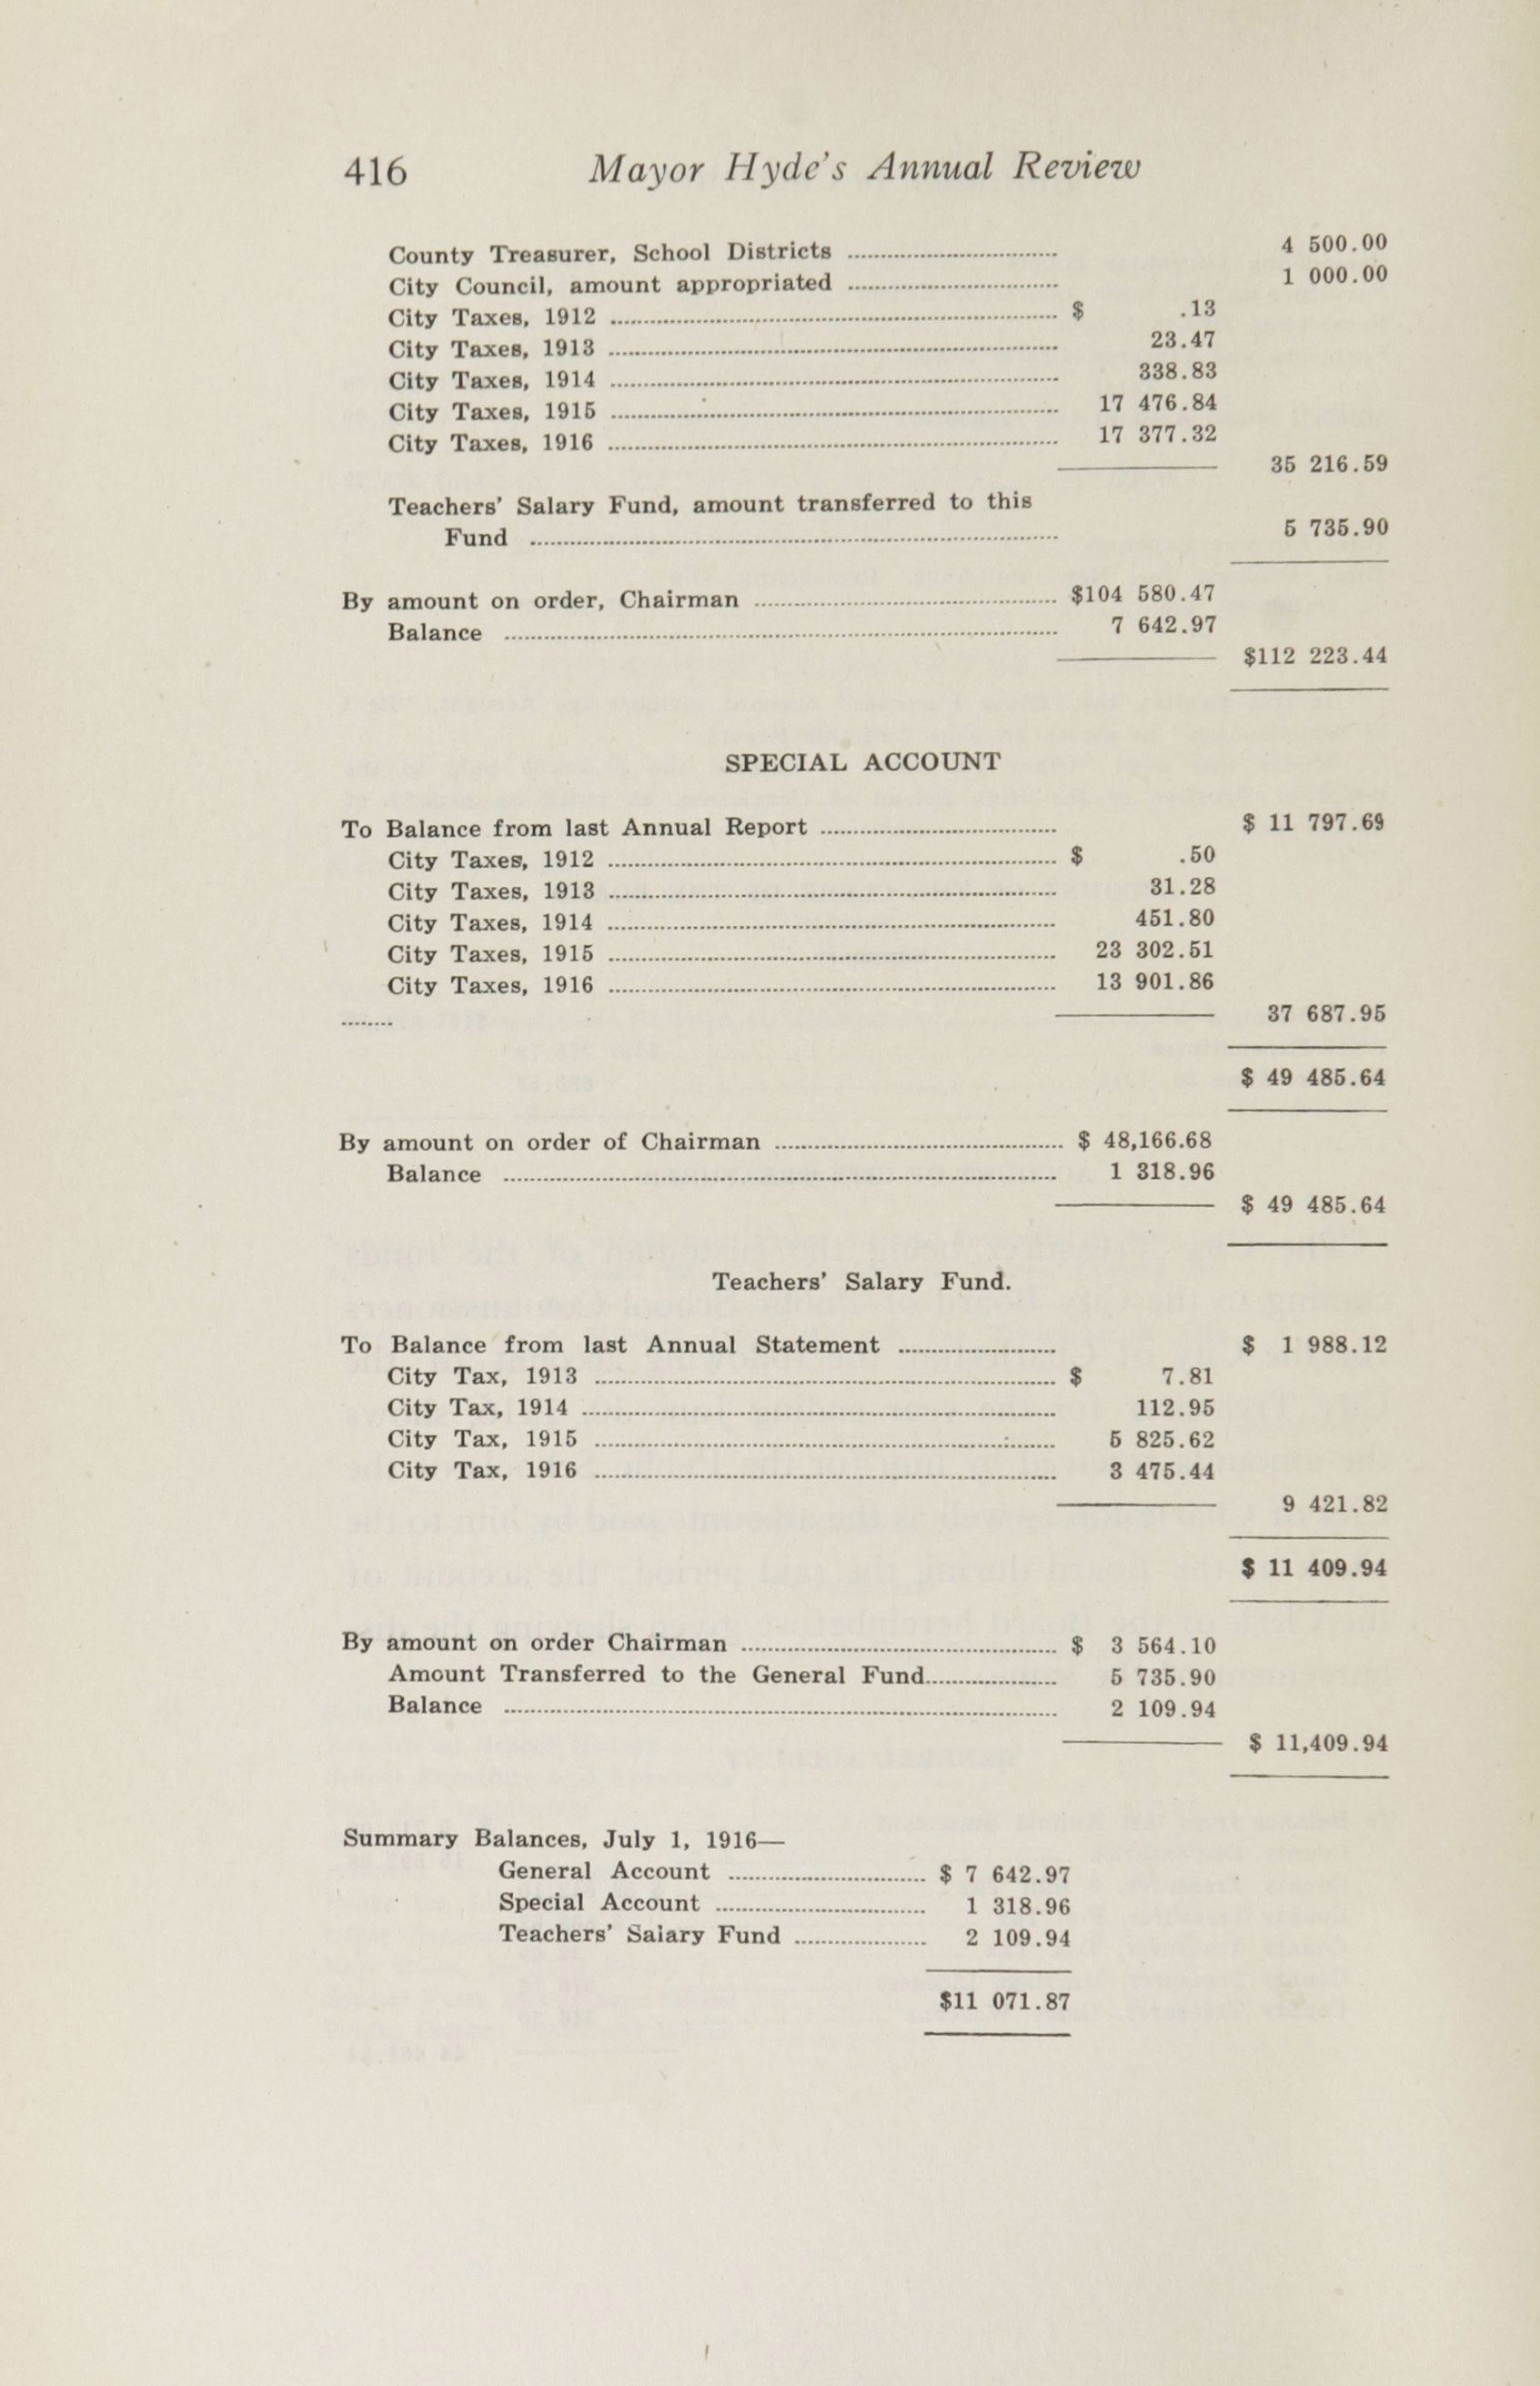 Charleston Yearbook, 1916, page 416